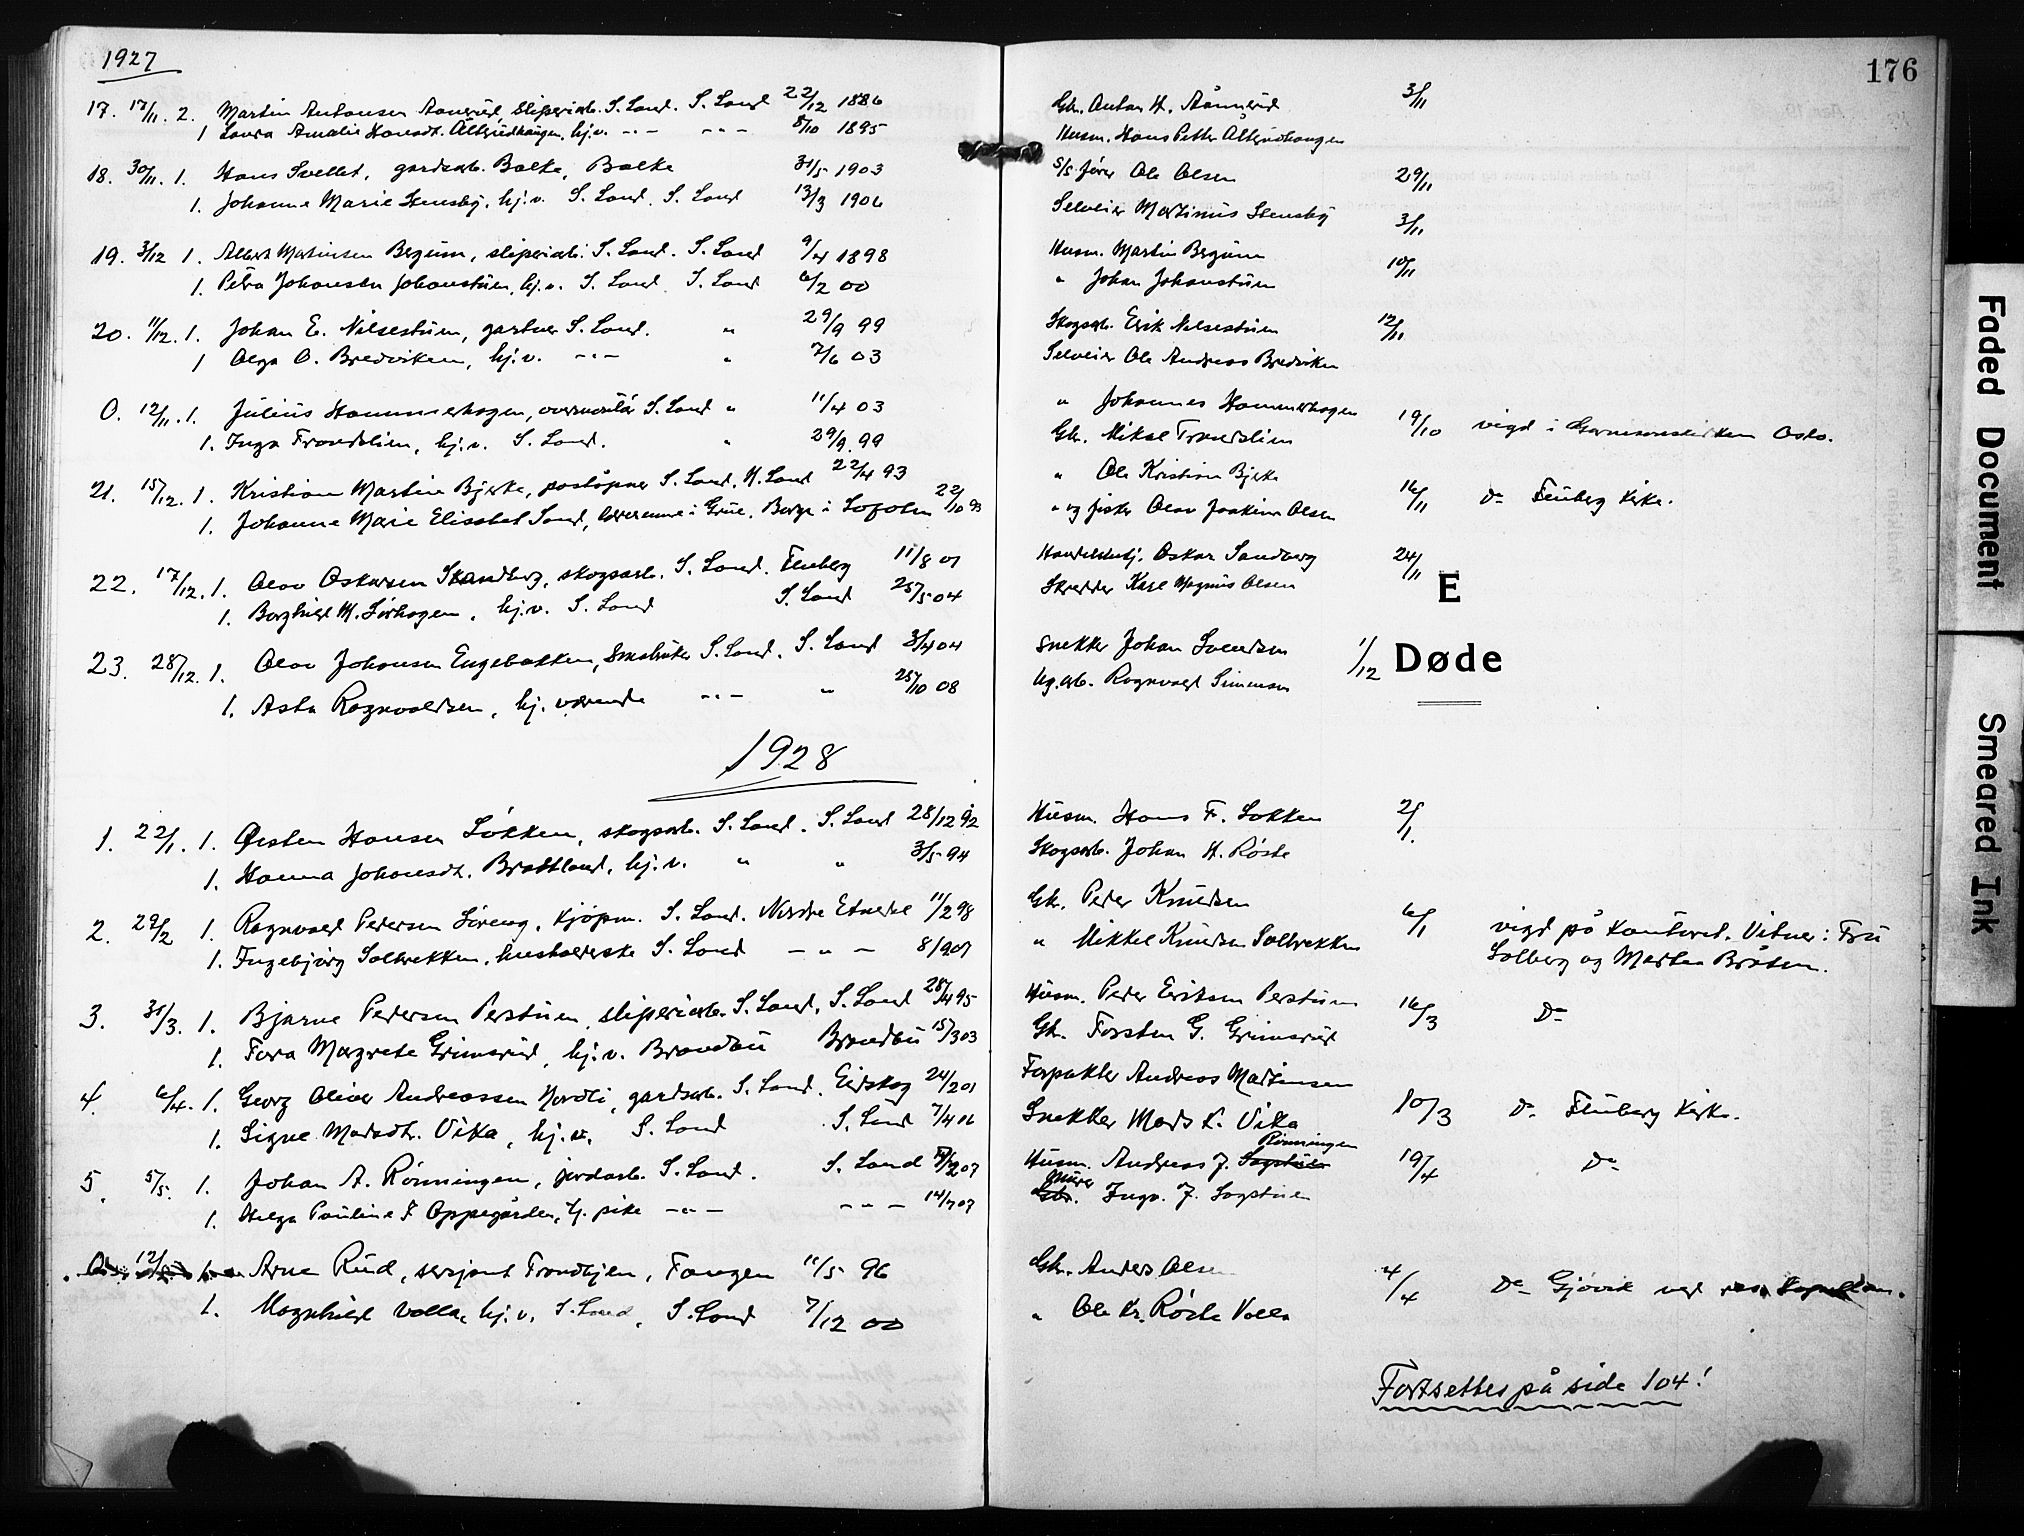 SAH, Søndre Land prestekontor, L/L0007: Klokkerbok nr. 7, 1915-1932, s. 176